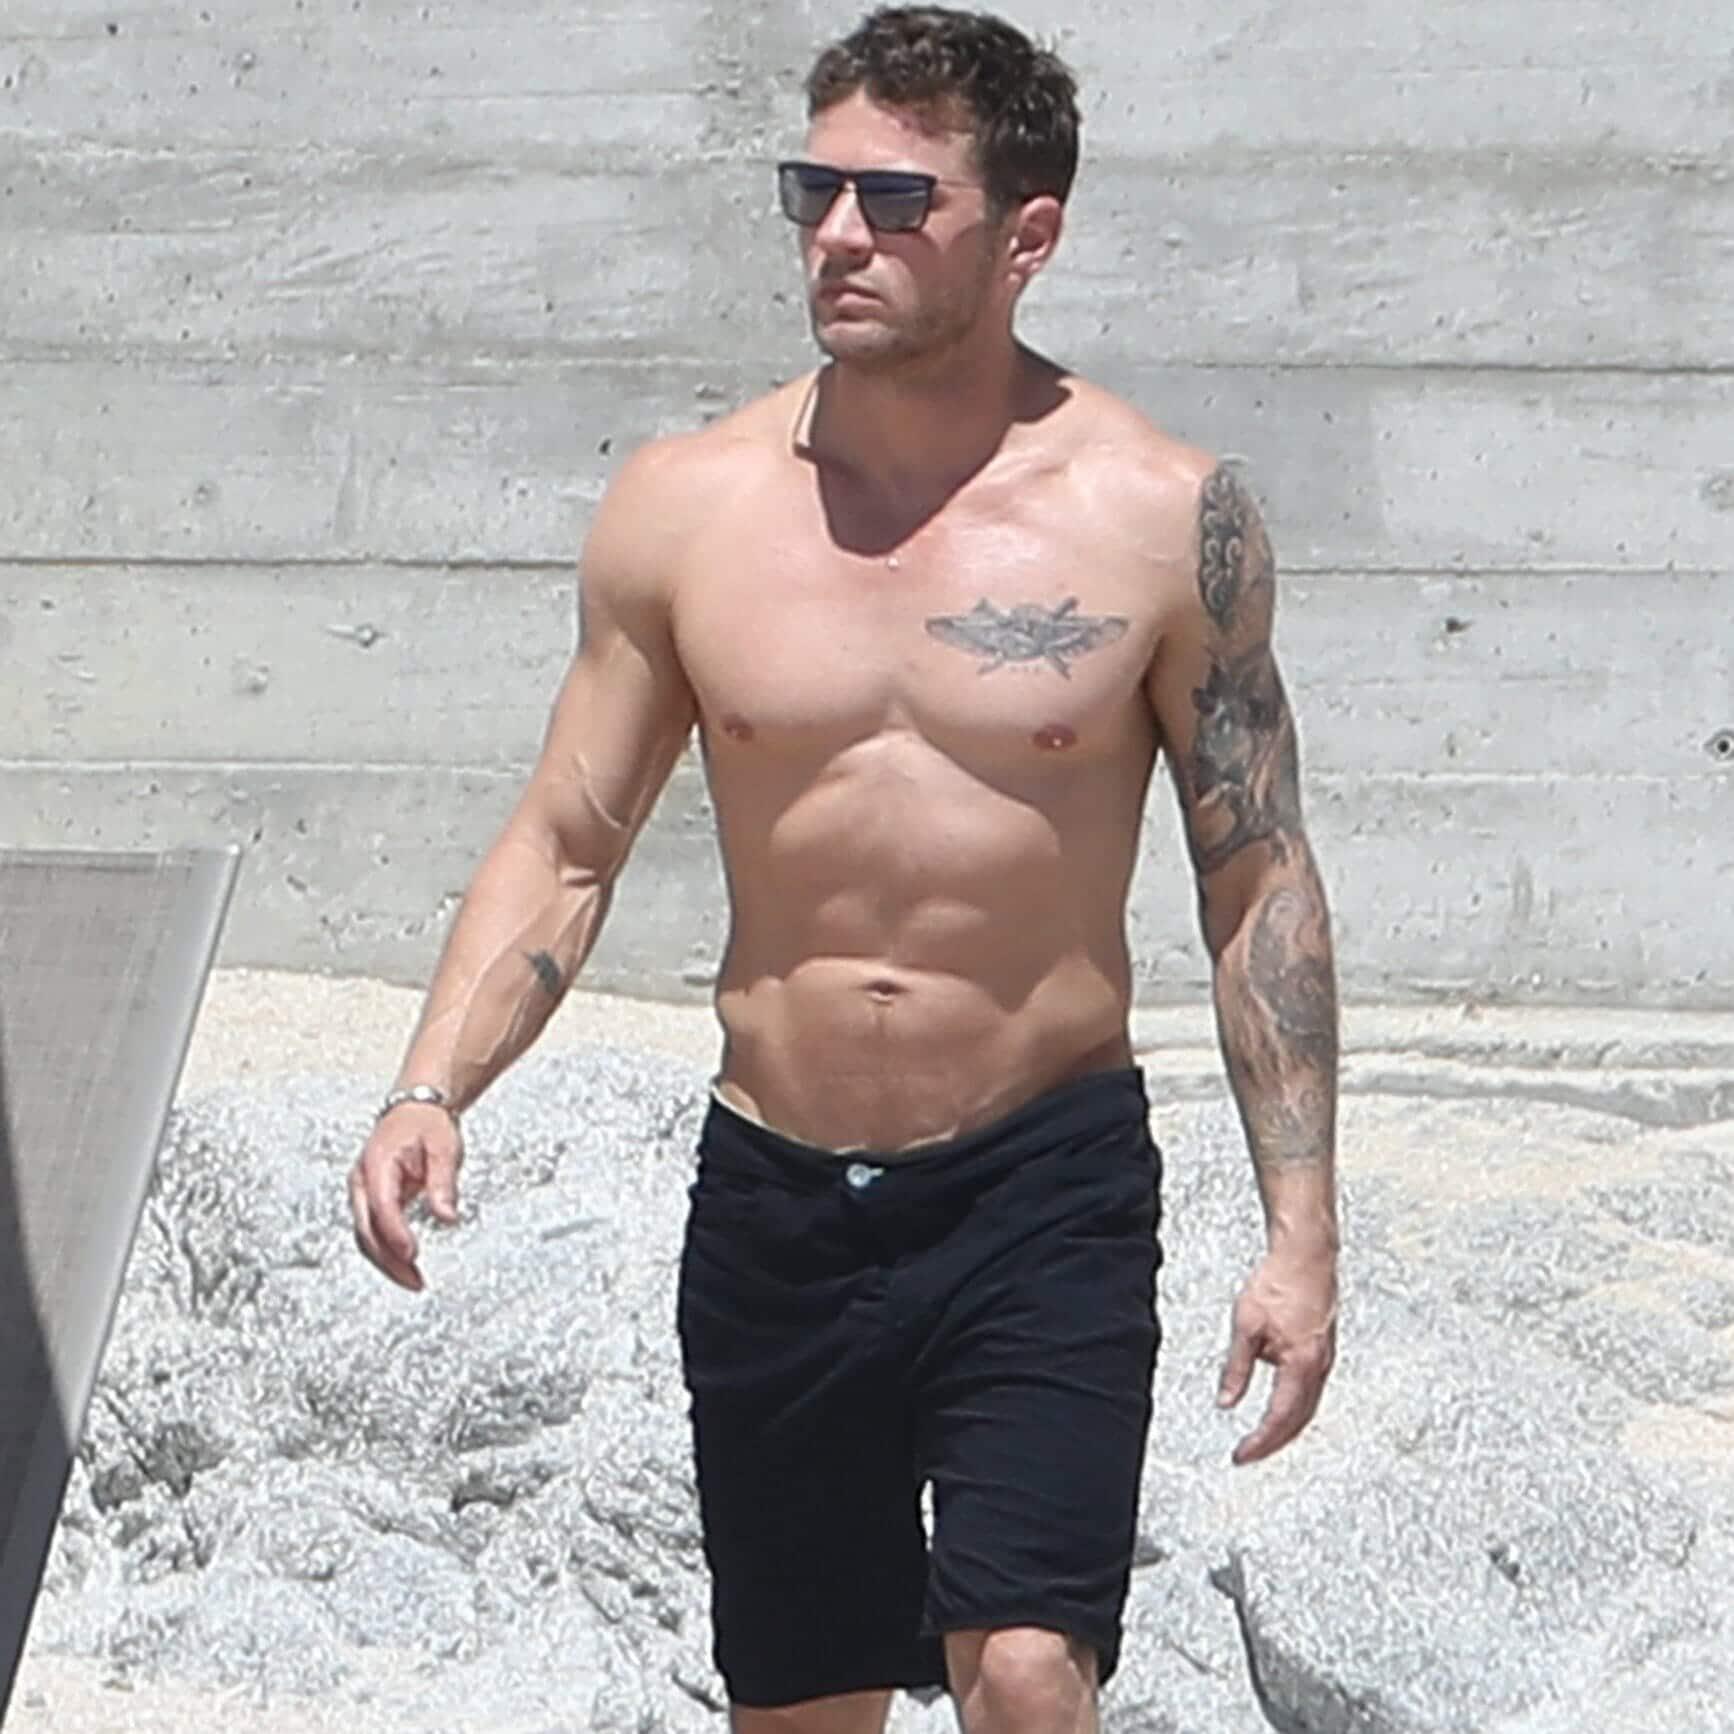 Ryan Phillippe naked shirtless pics (8)